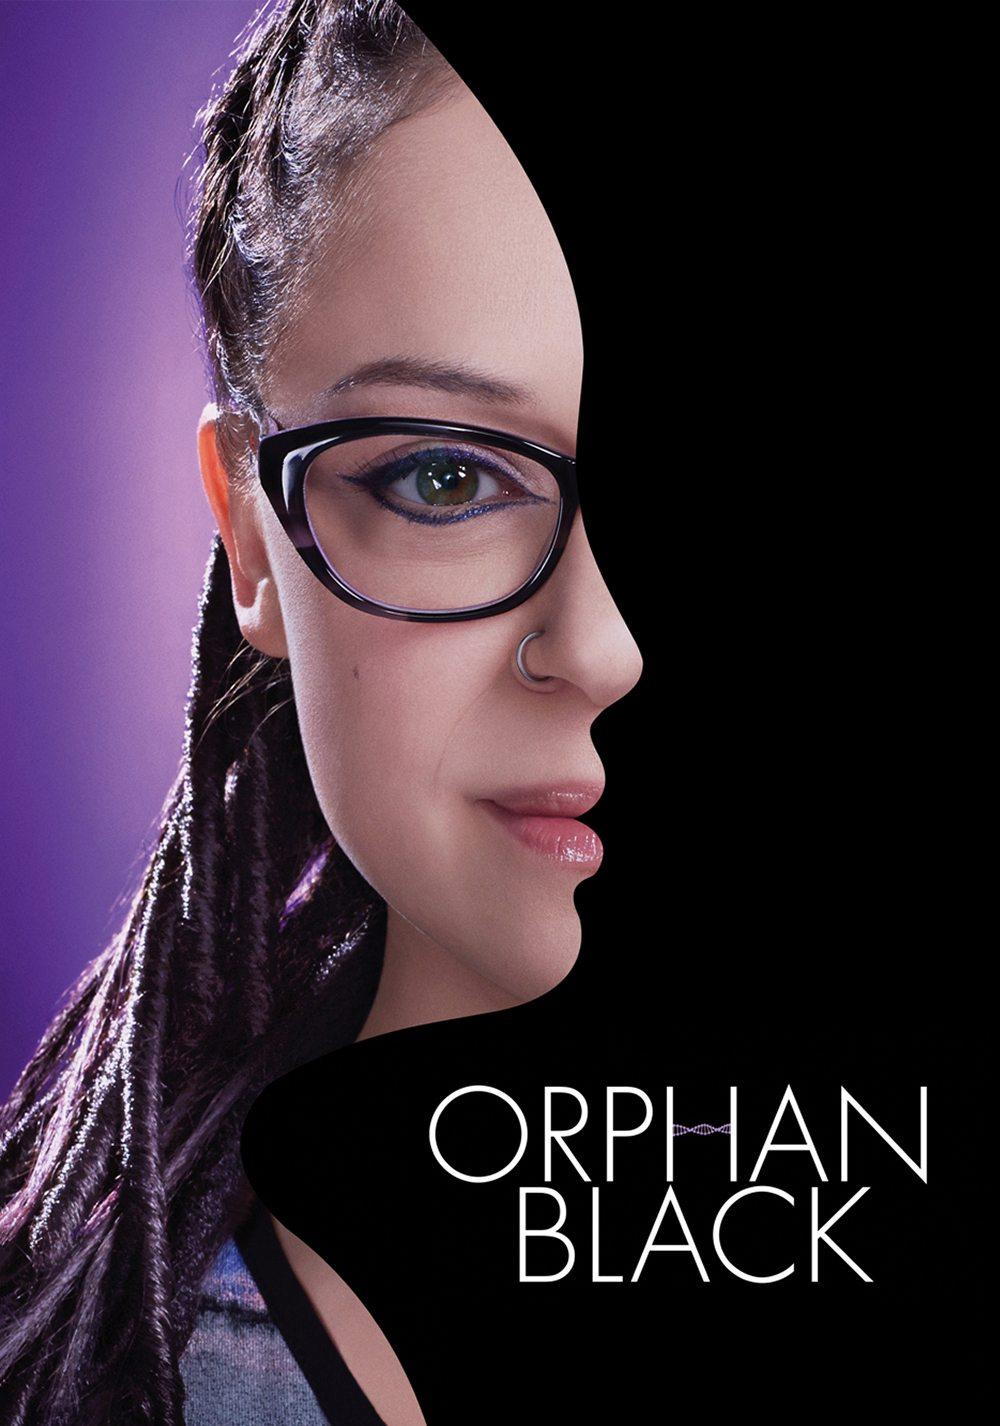 orphan-black-5342a8e88a2e1